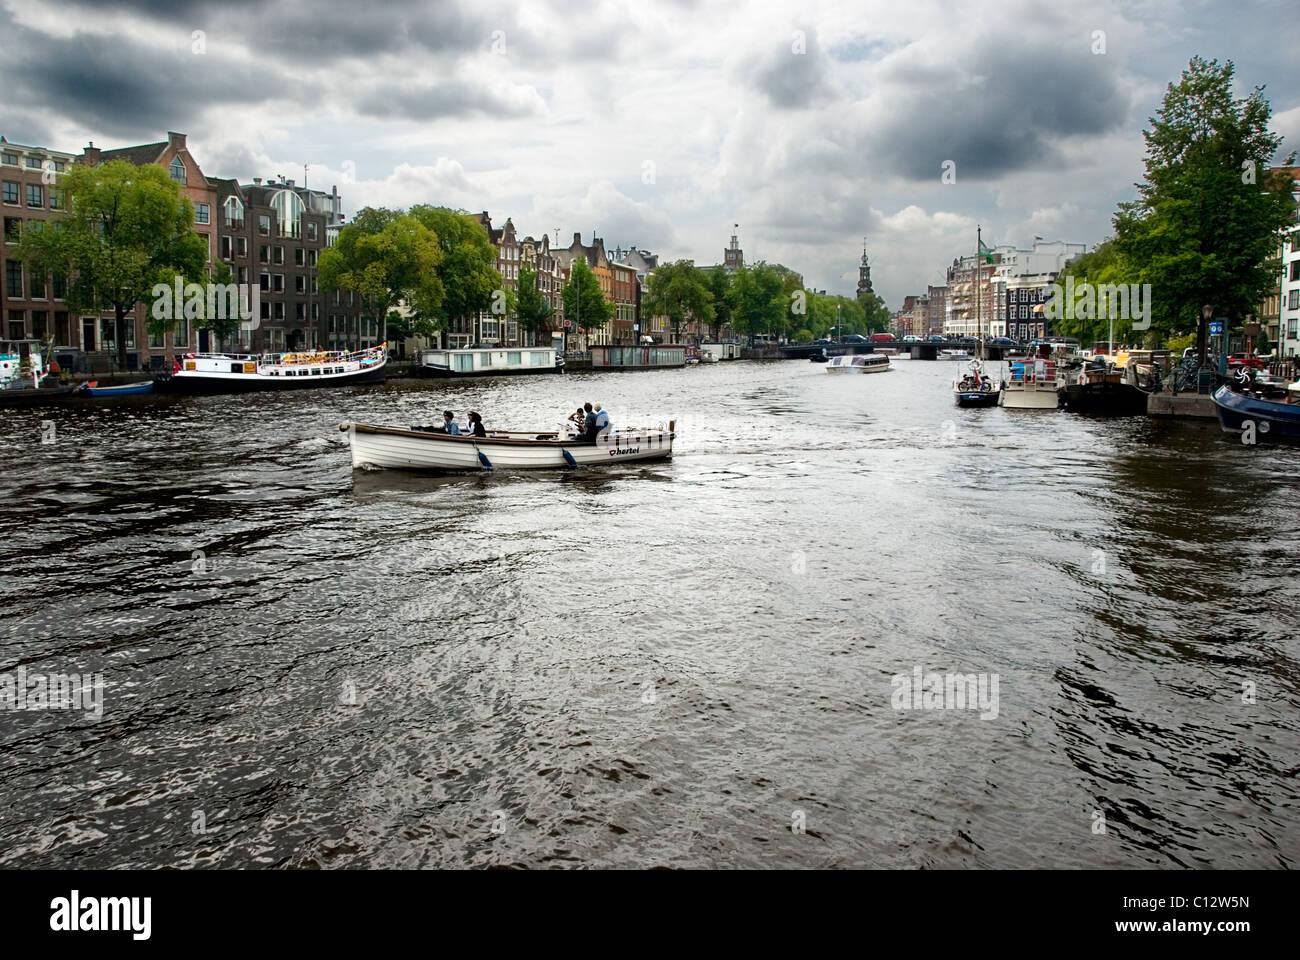 Battelli in Amsterdam, Olanda Immagini Stock